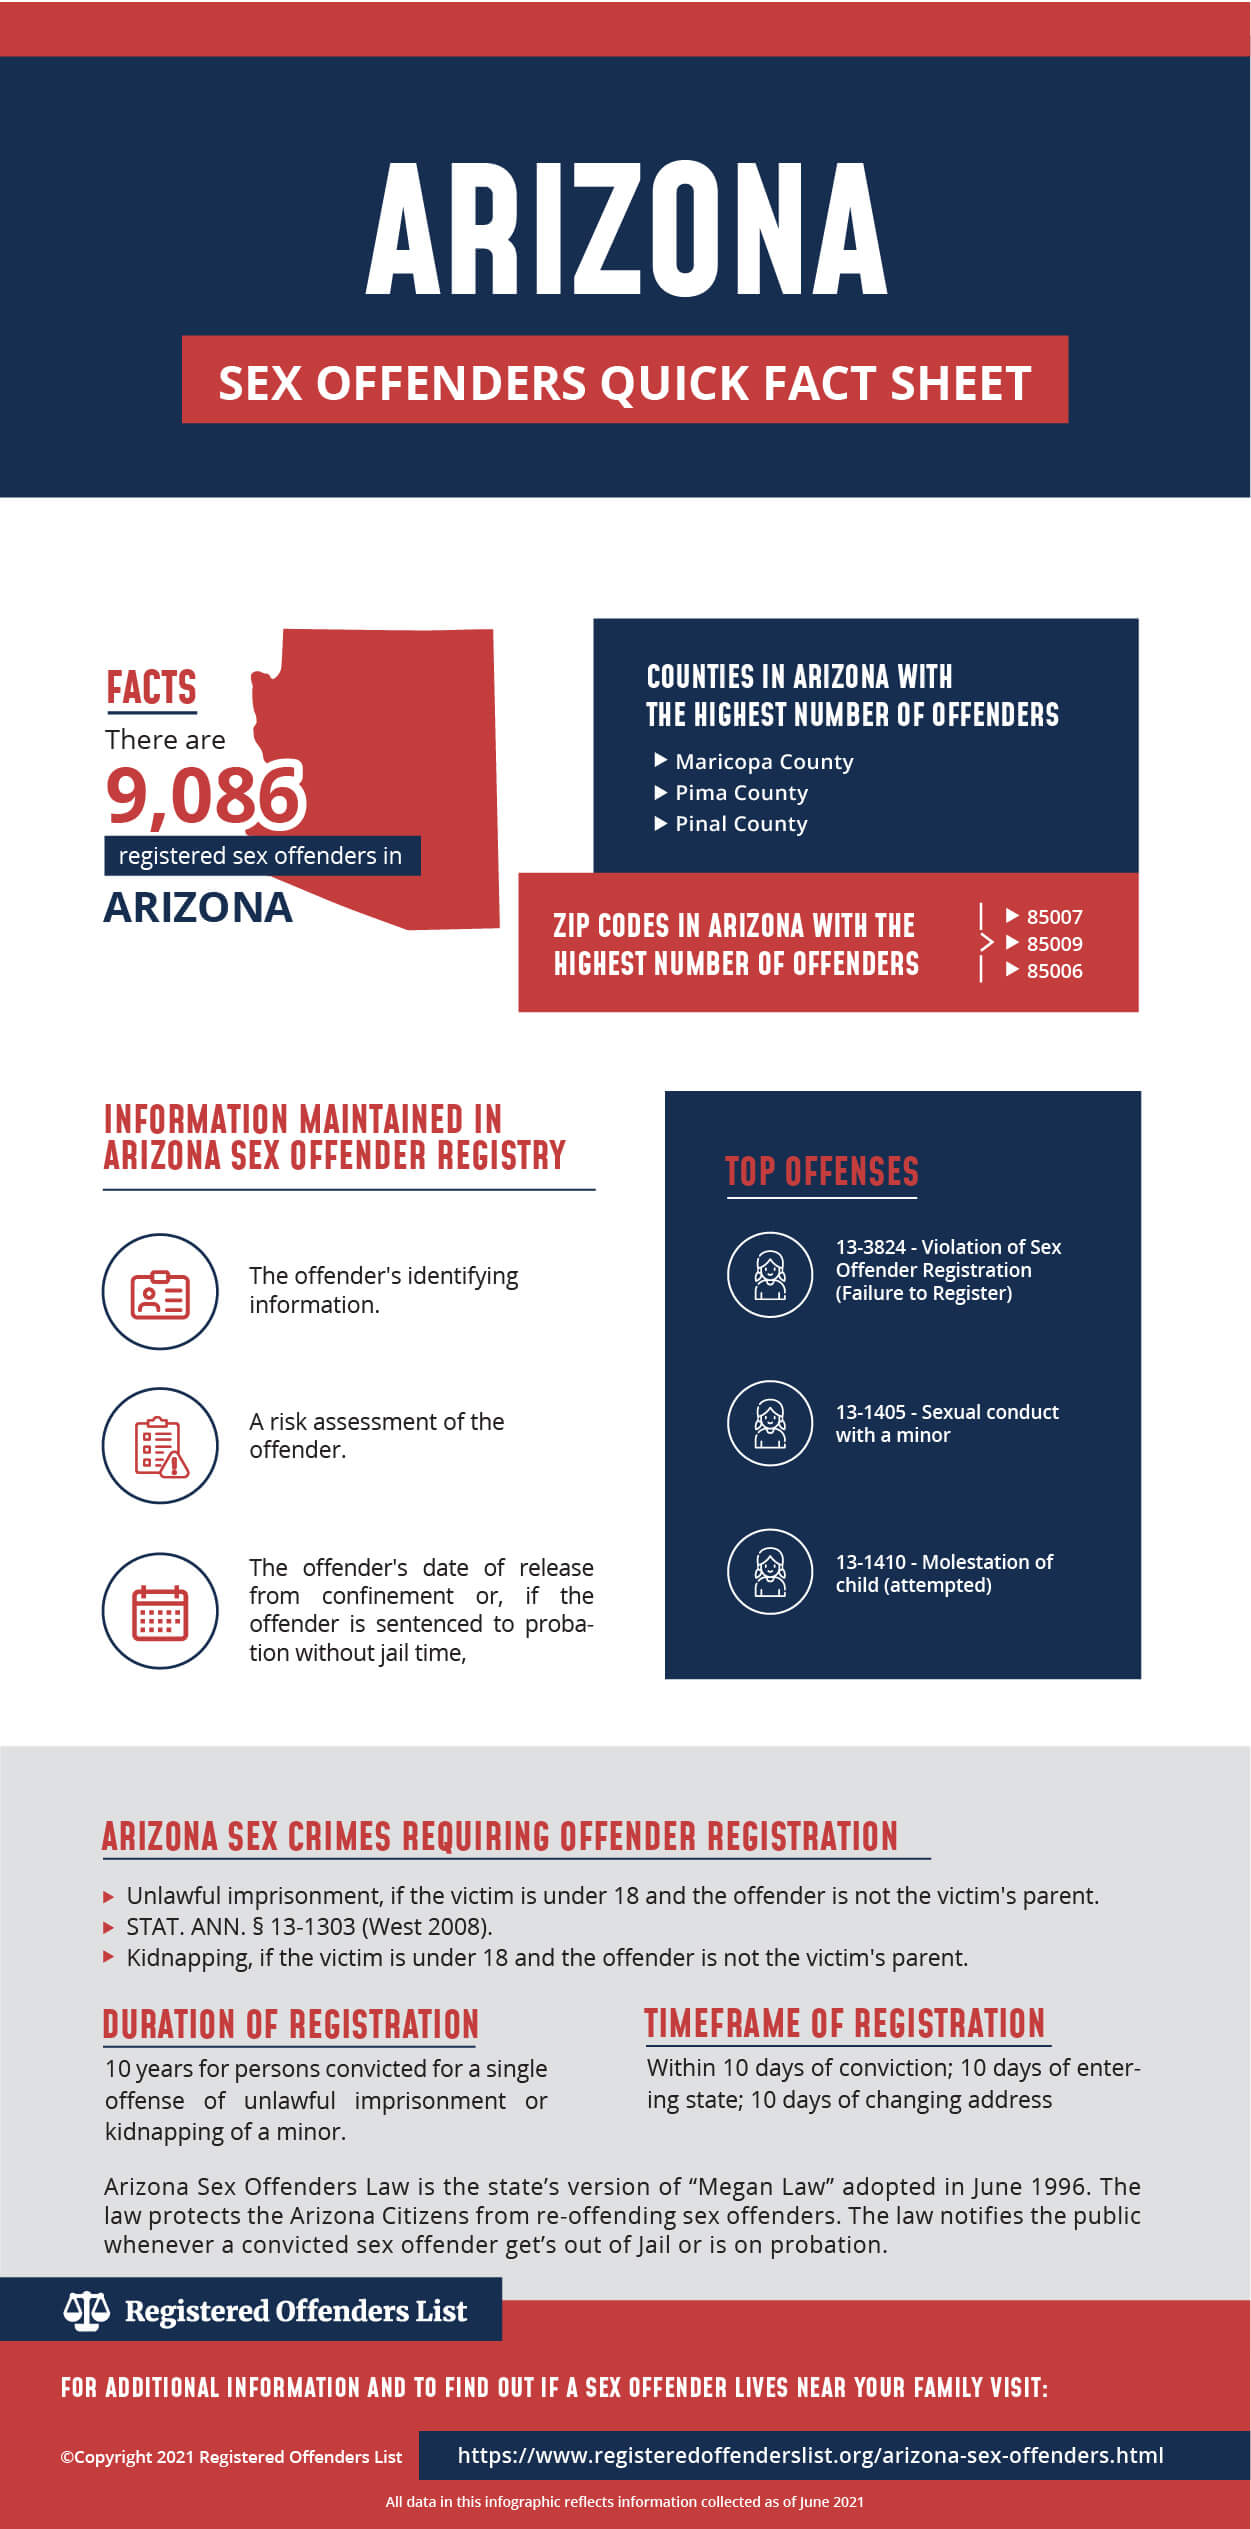 Arizona offender sex site web